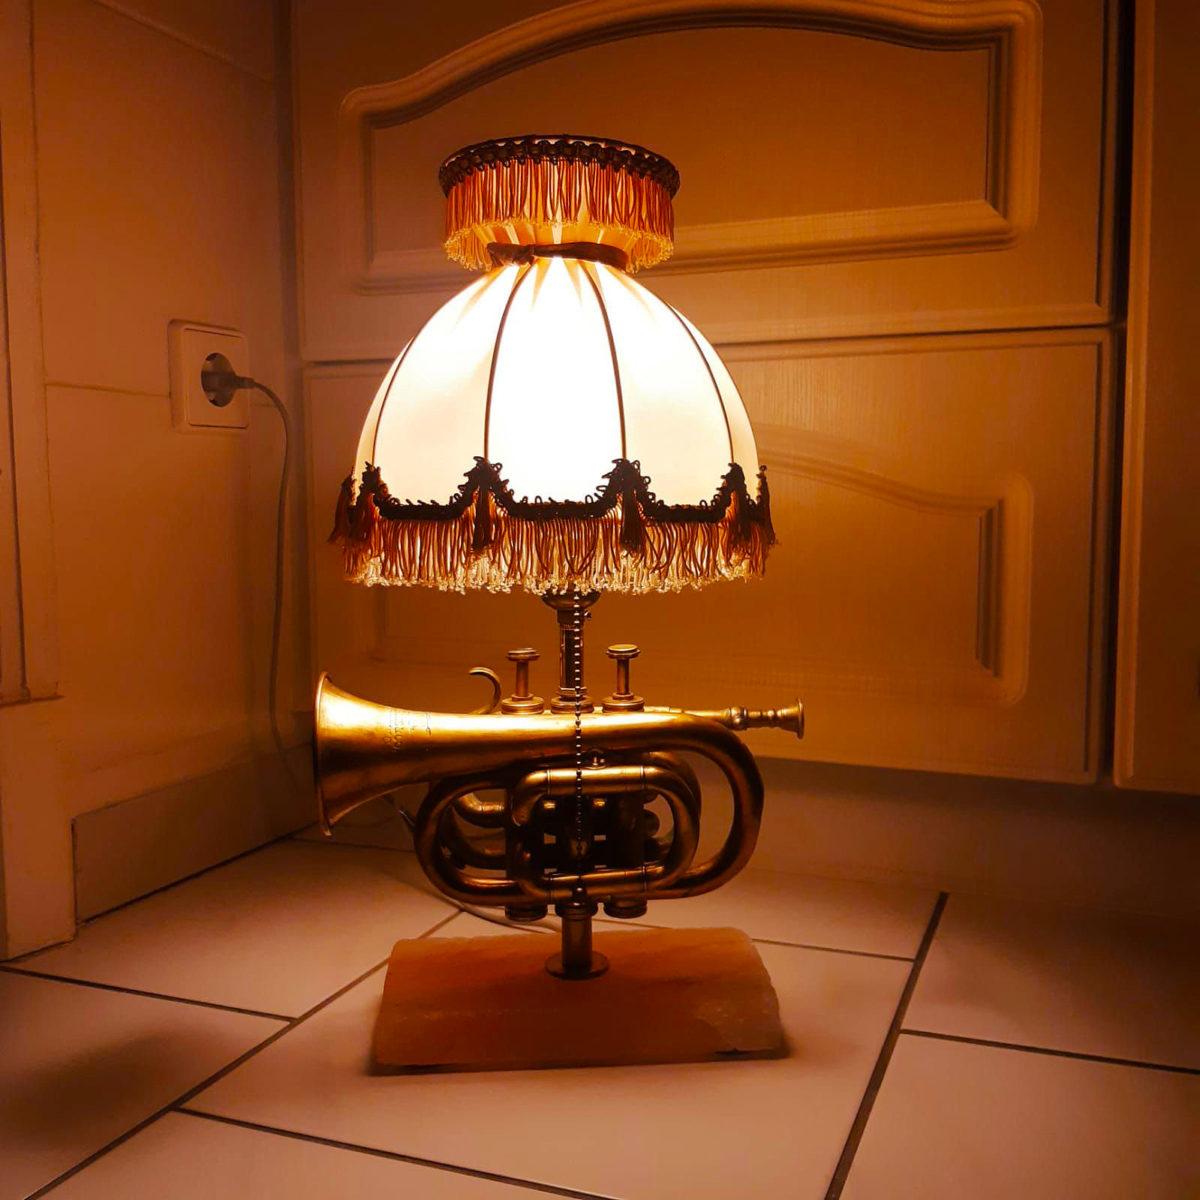 Trumpet lamp table lamp salt block fringes vintage retro